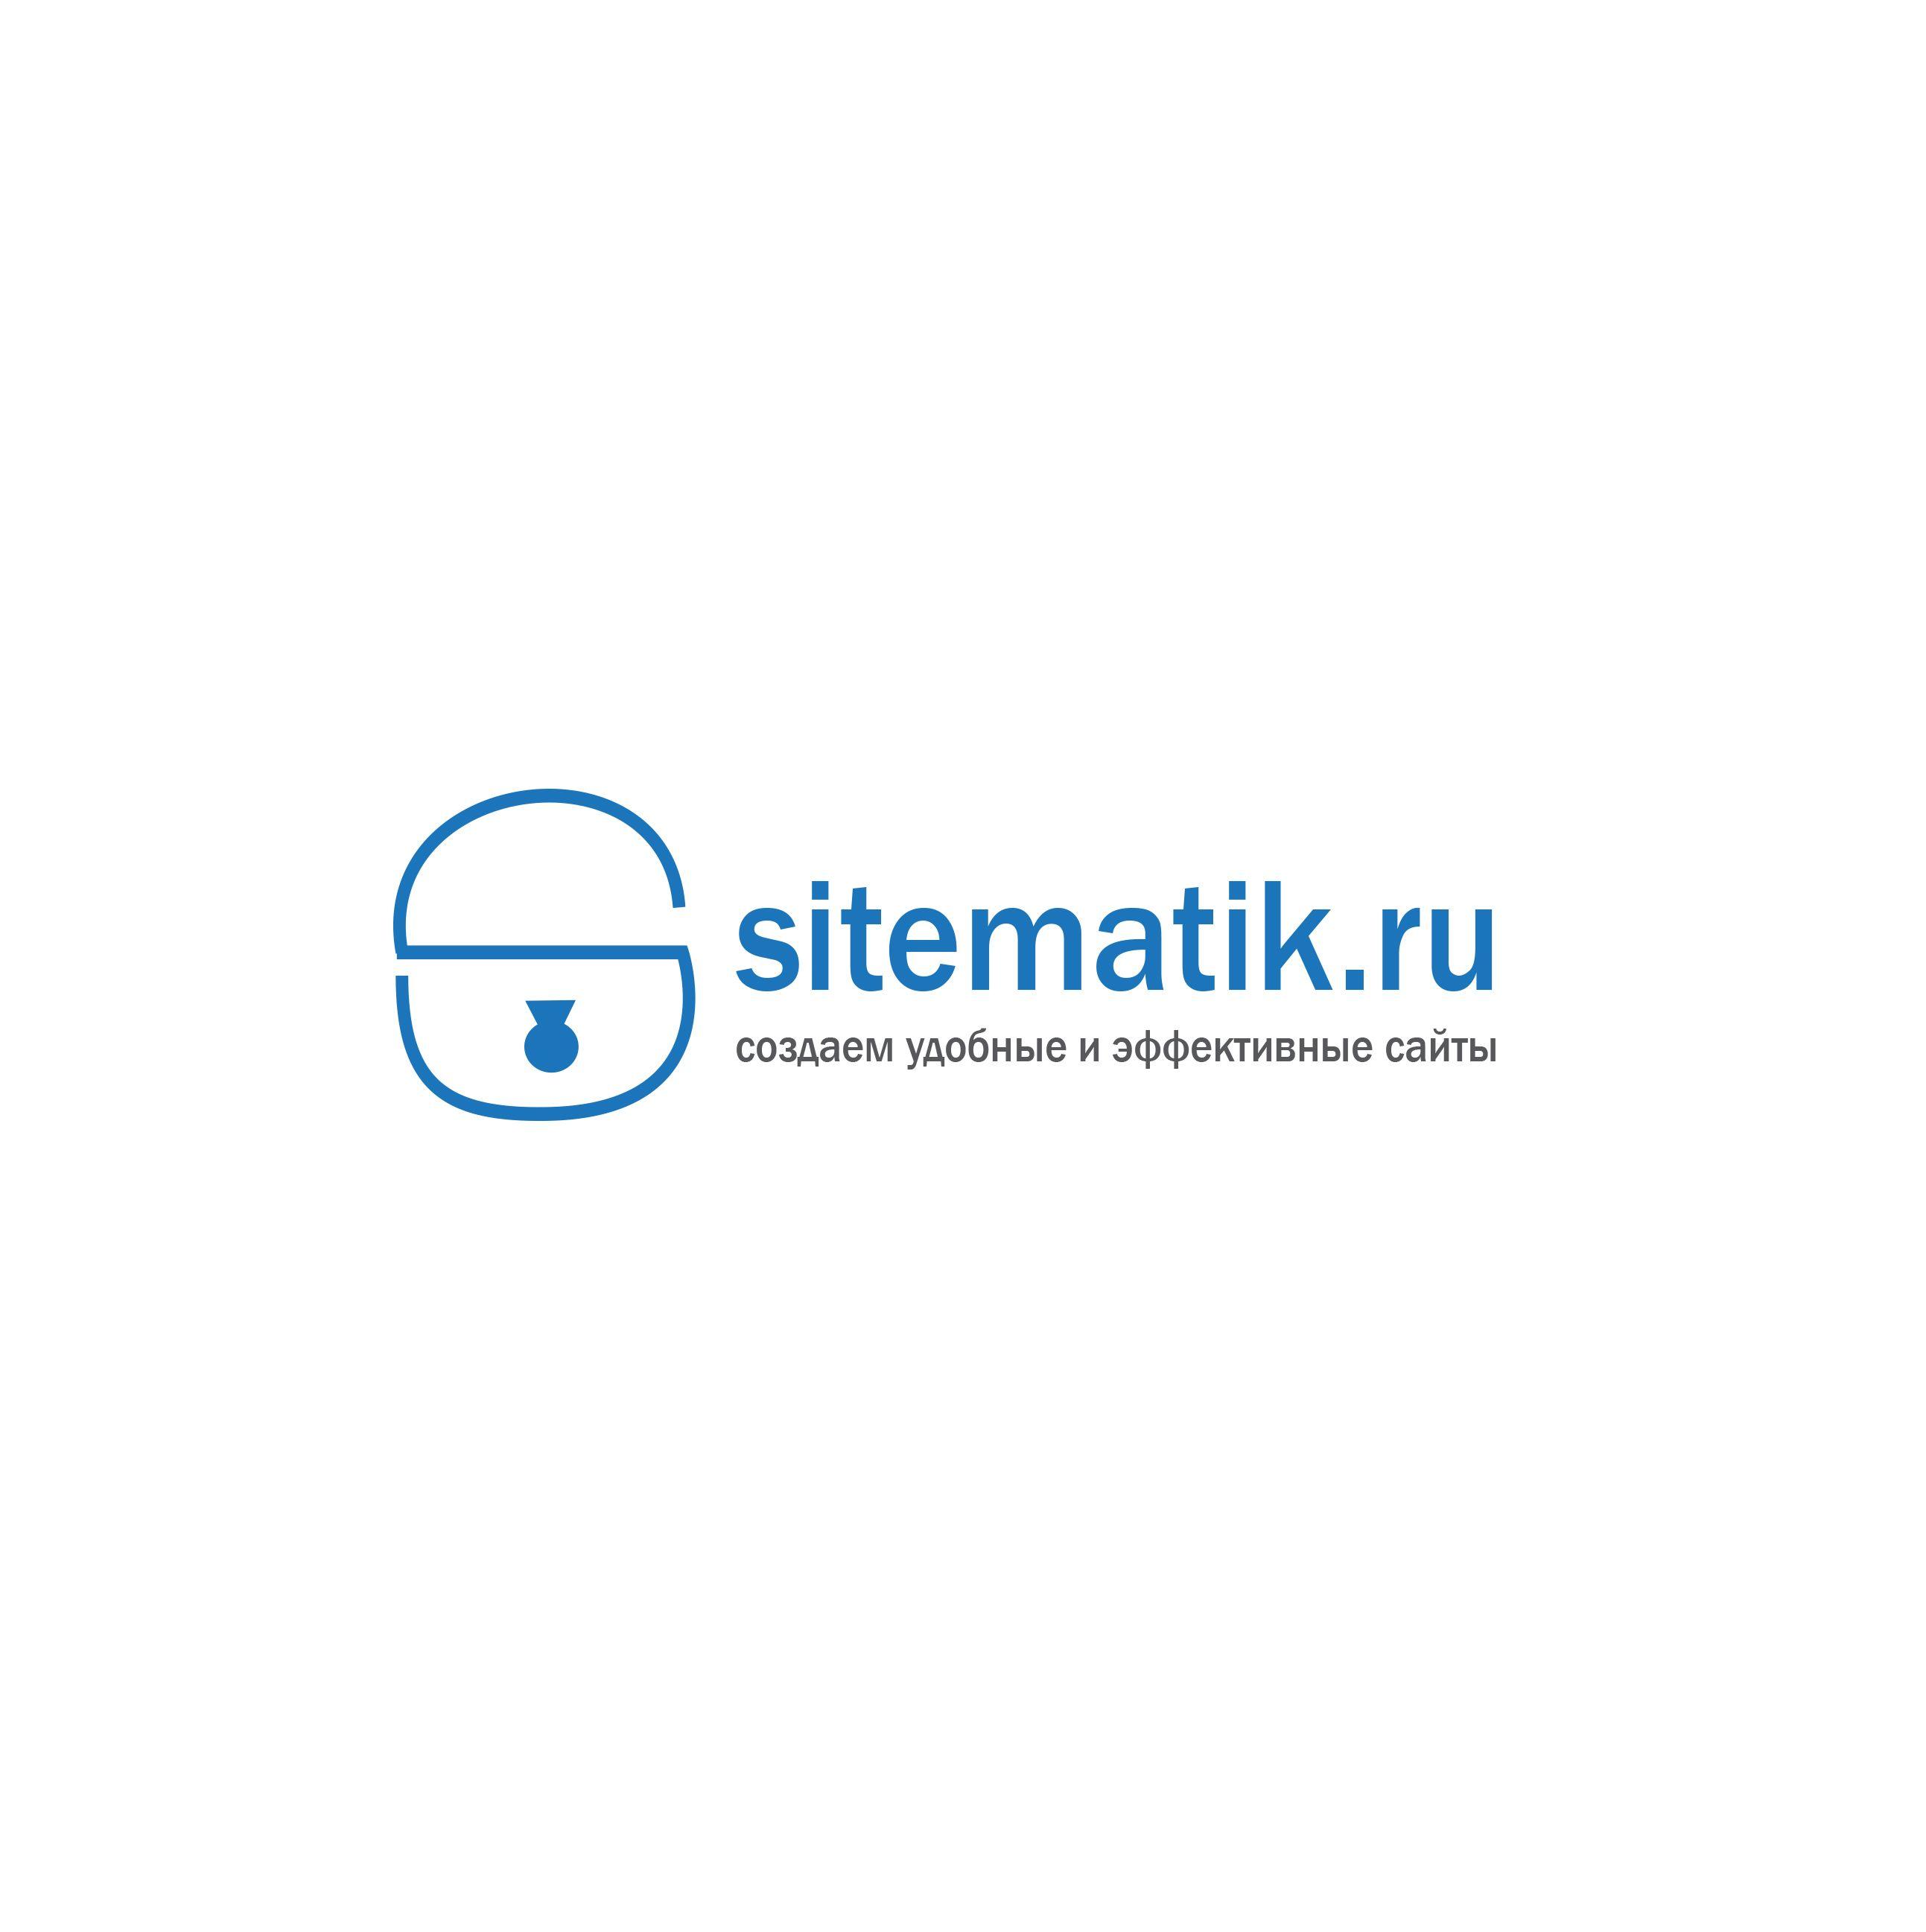 Логотип для Веб-студии - дизайнер jmerkulov